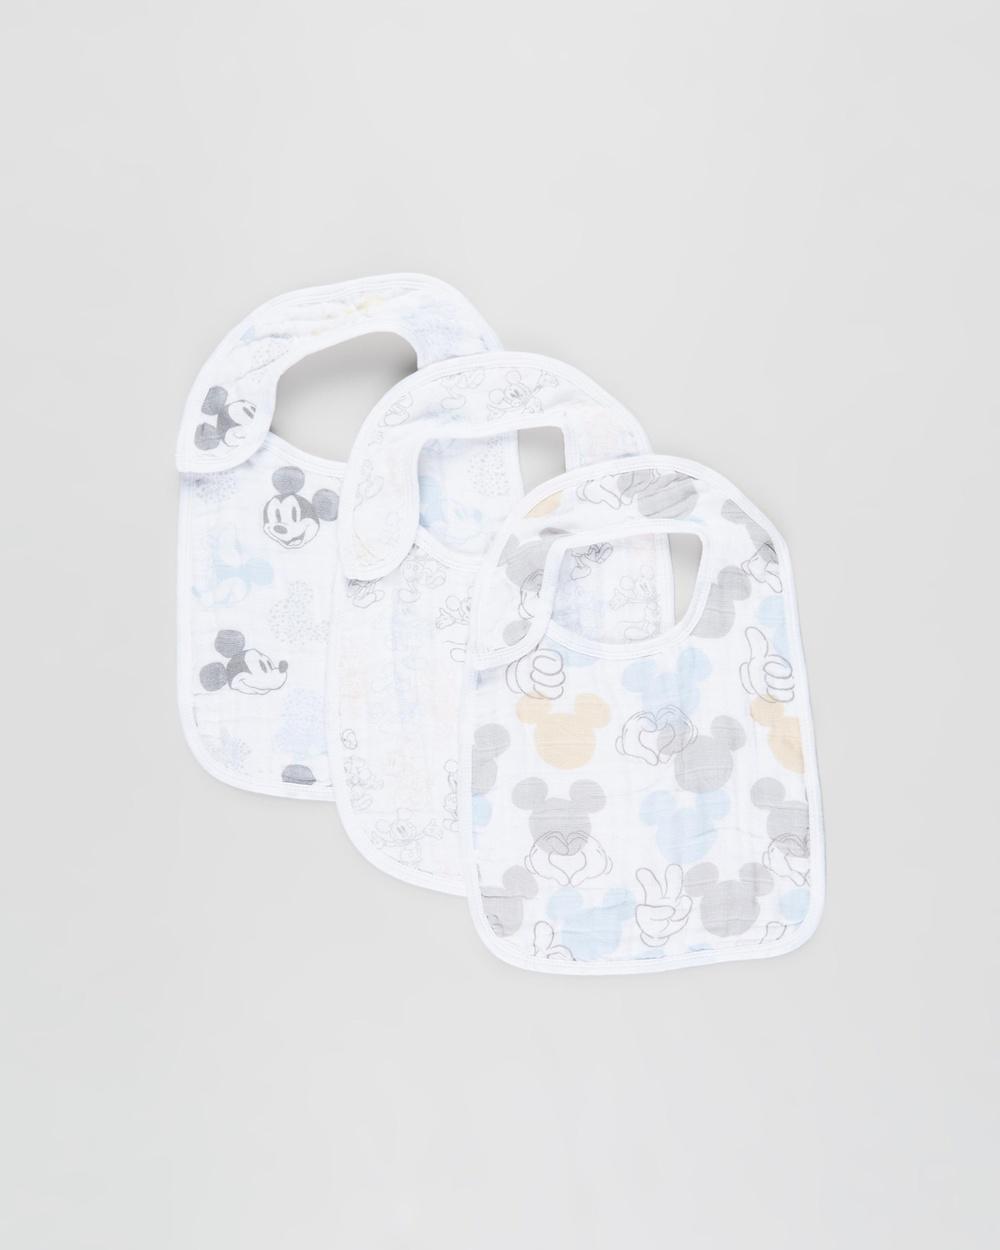 Aden & Anais 3 Pack Classic Snap Bibs Nursing Feeding Mickey + Minnie 3-Pack